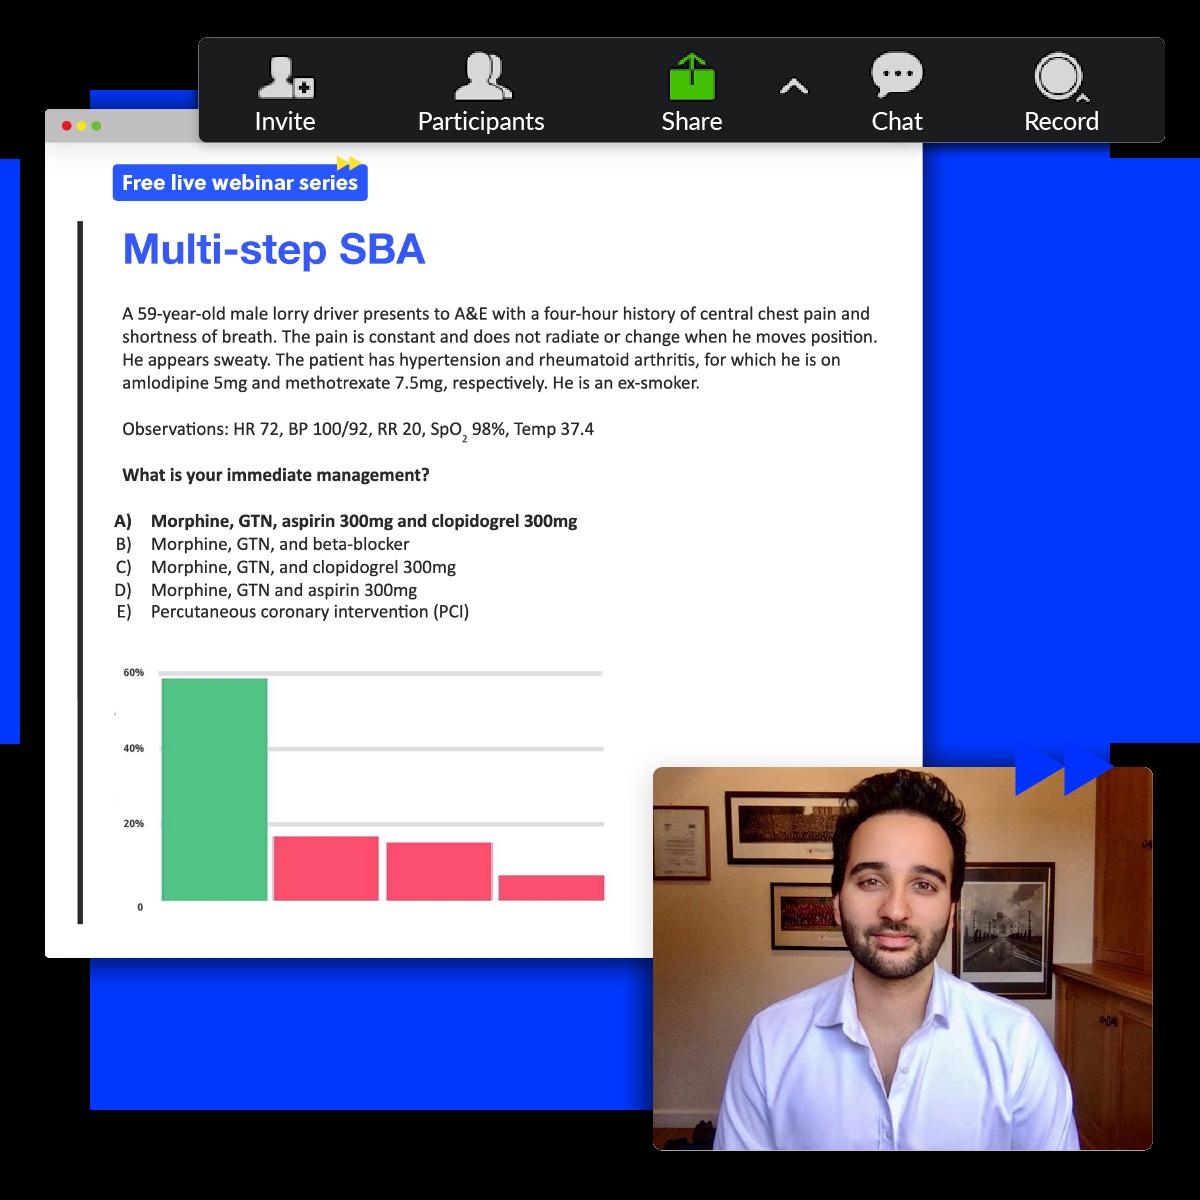 Live Webinars User Interface and Presenter Shown